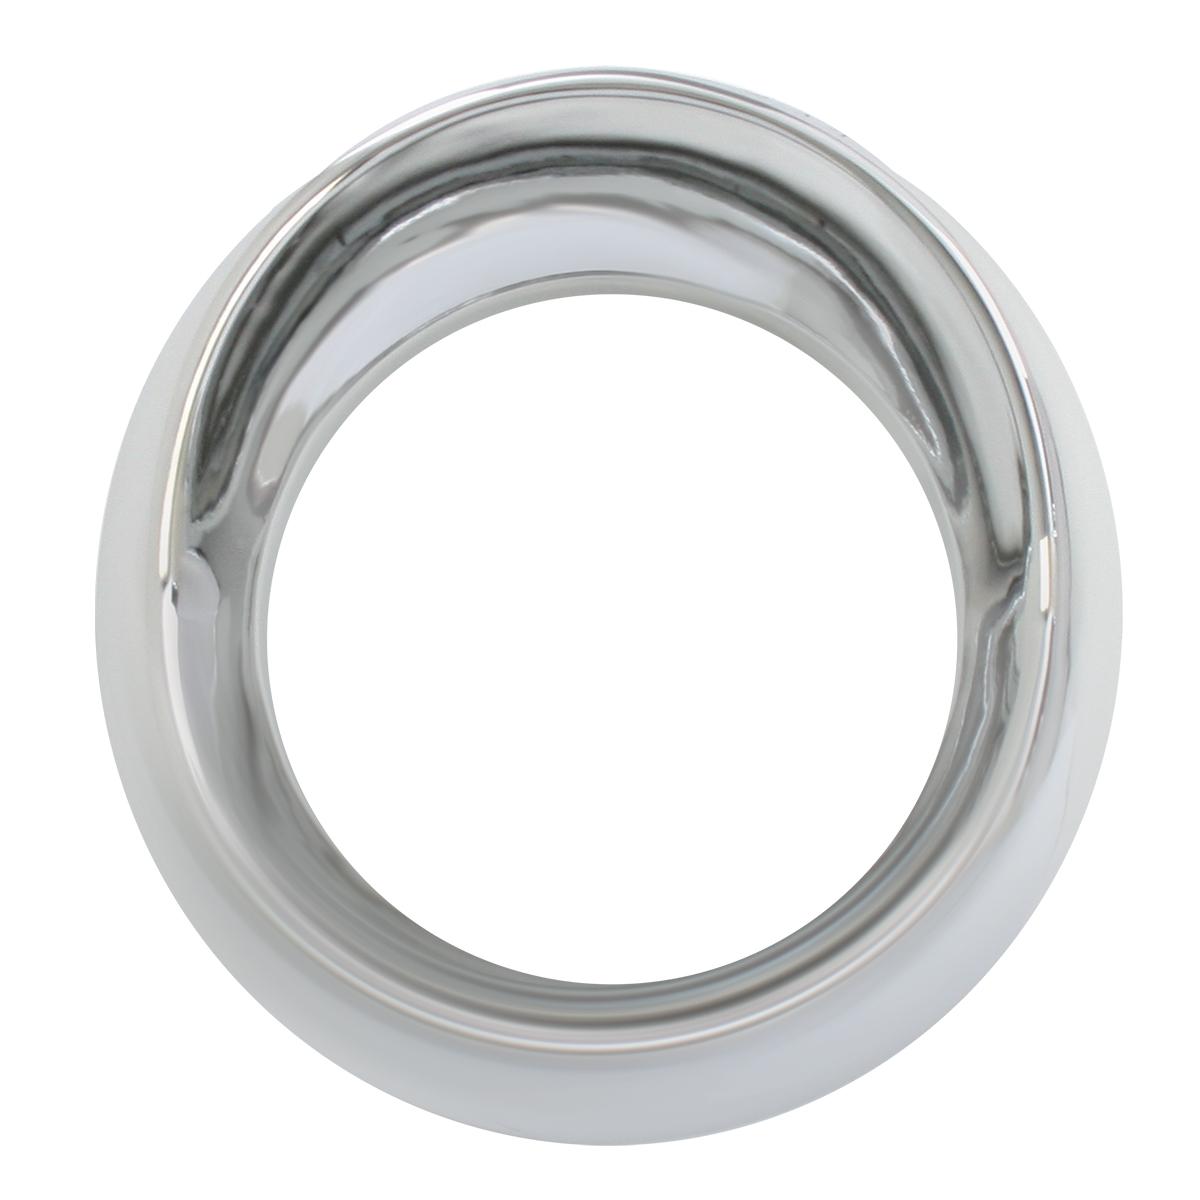 68225 Chrome Plastic Speed/Tachometer Snap-On Gauge Cover w/ Visor for KW